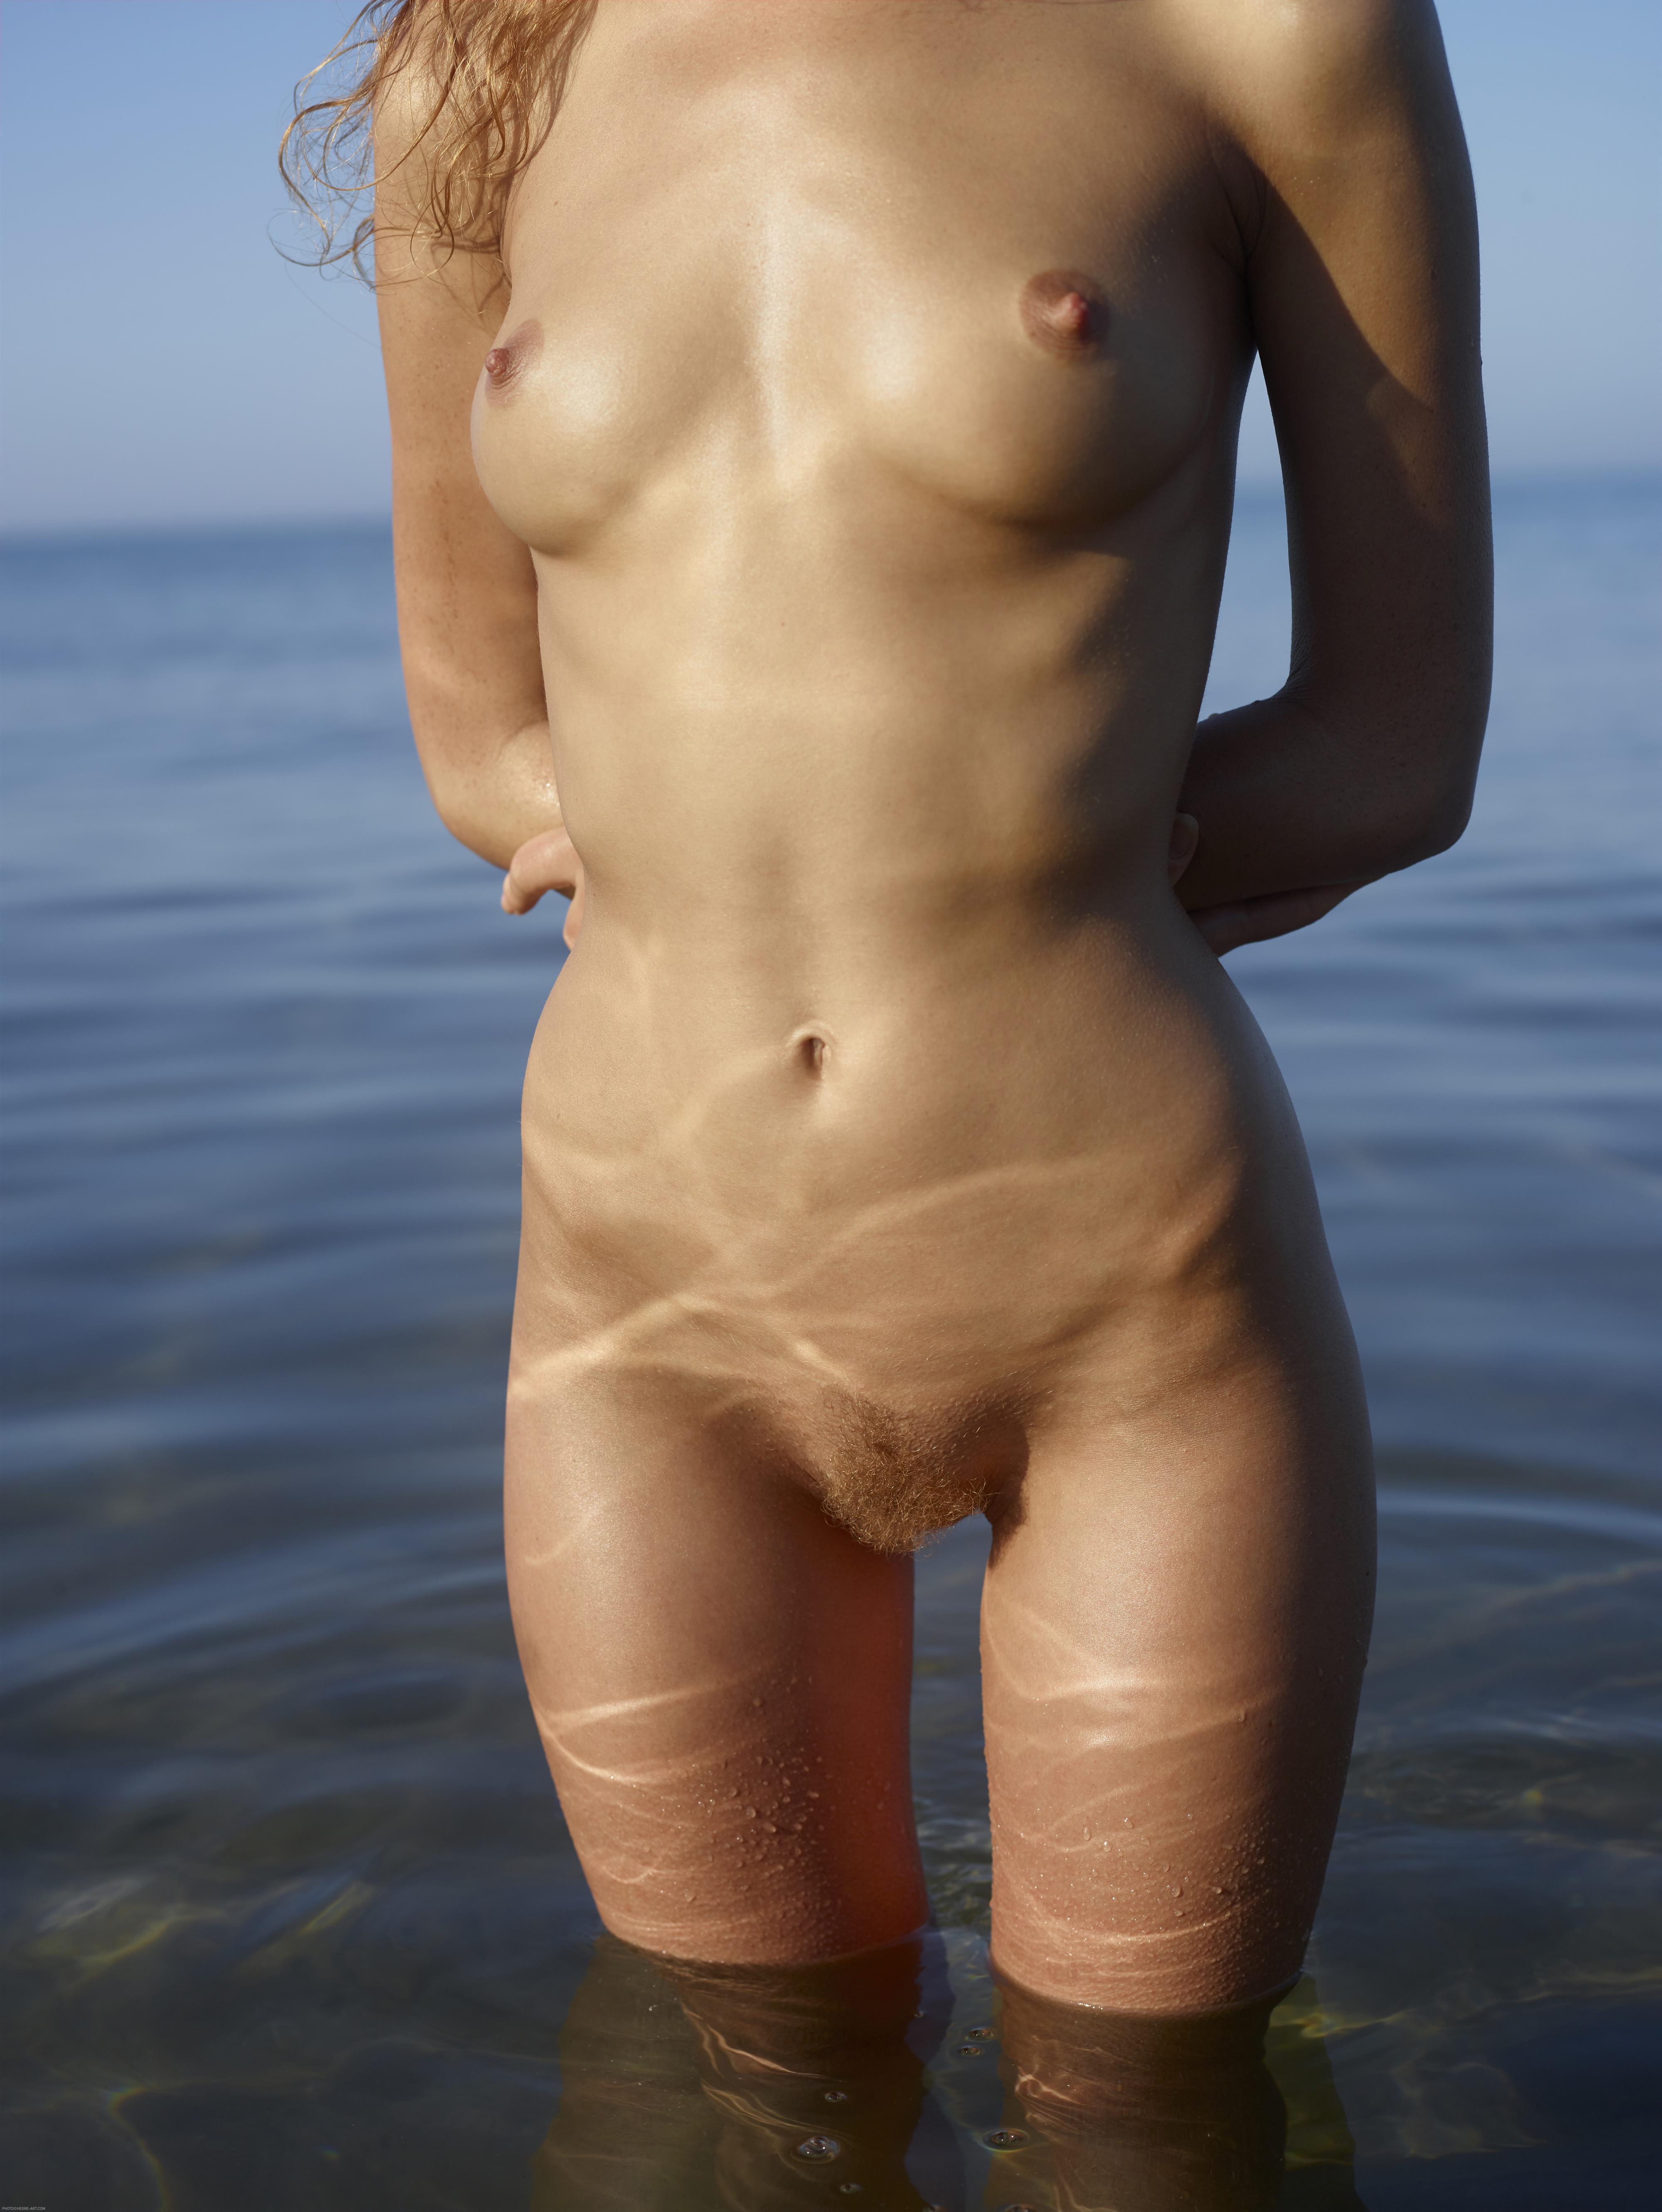 julia yaroshenko nude pictures rating 6 48 10